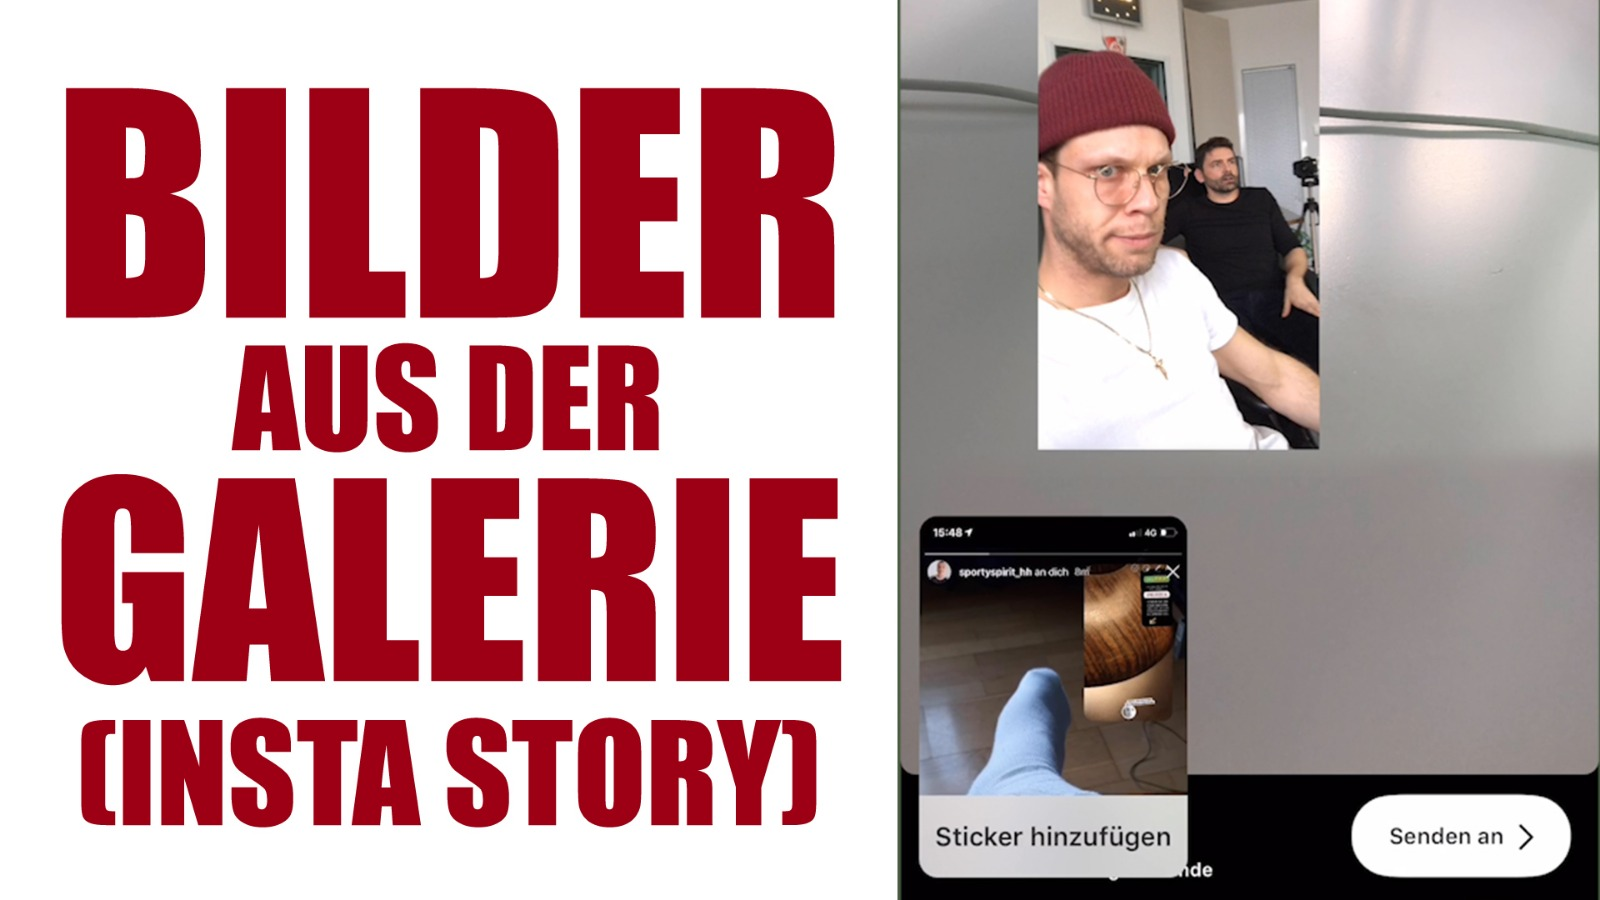 Mehrere Bilder In Instagram Story Posten 🖼